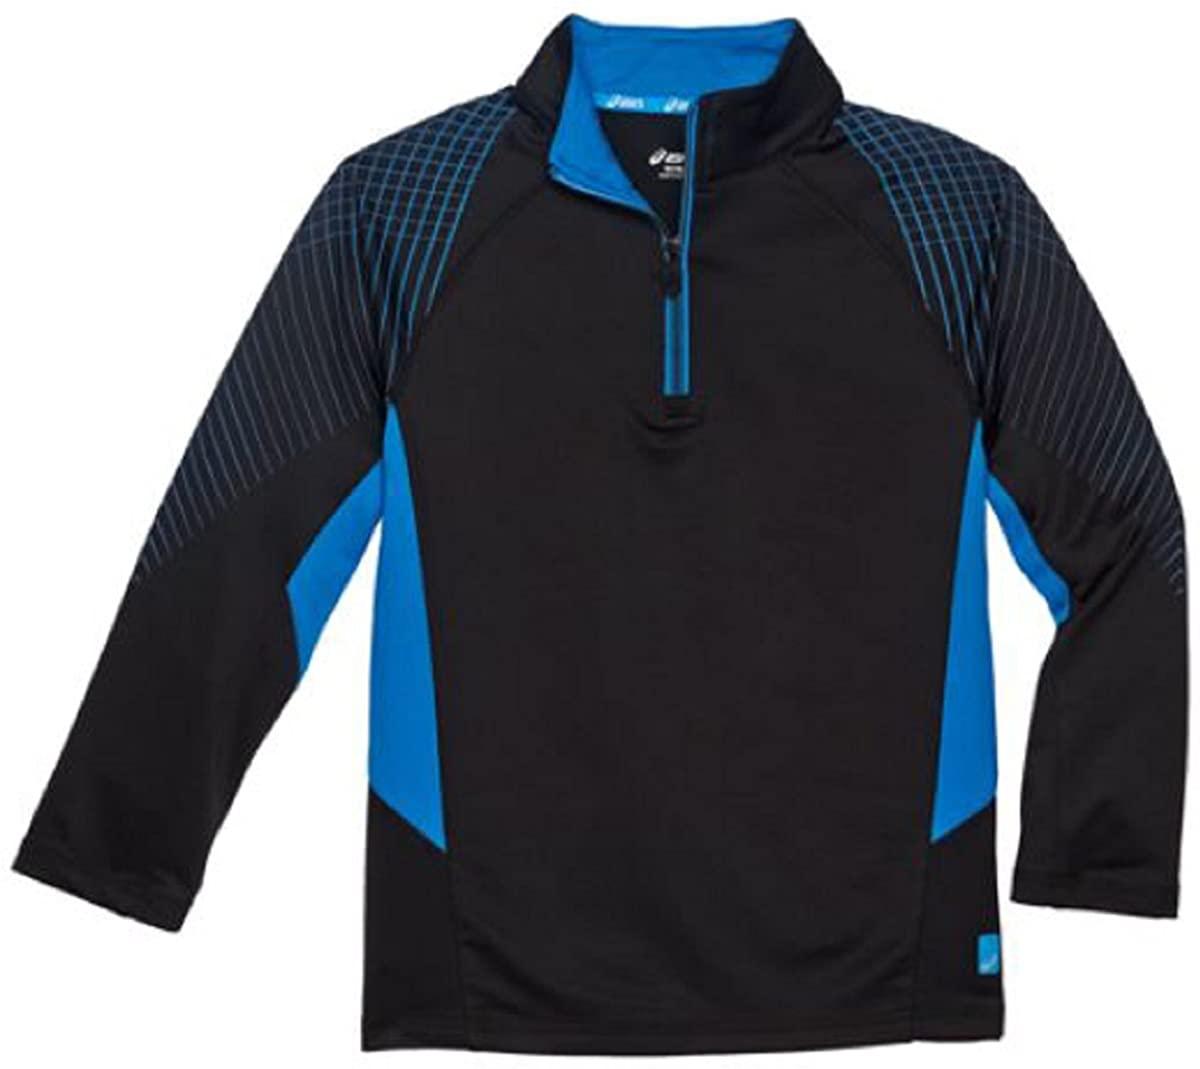 ASICS Boys Youth 1/4 Zip Top, Pullover Shirt Jacket (XS (5/6), Black)